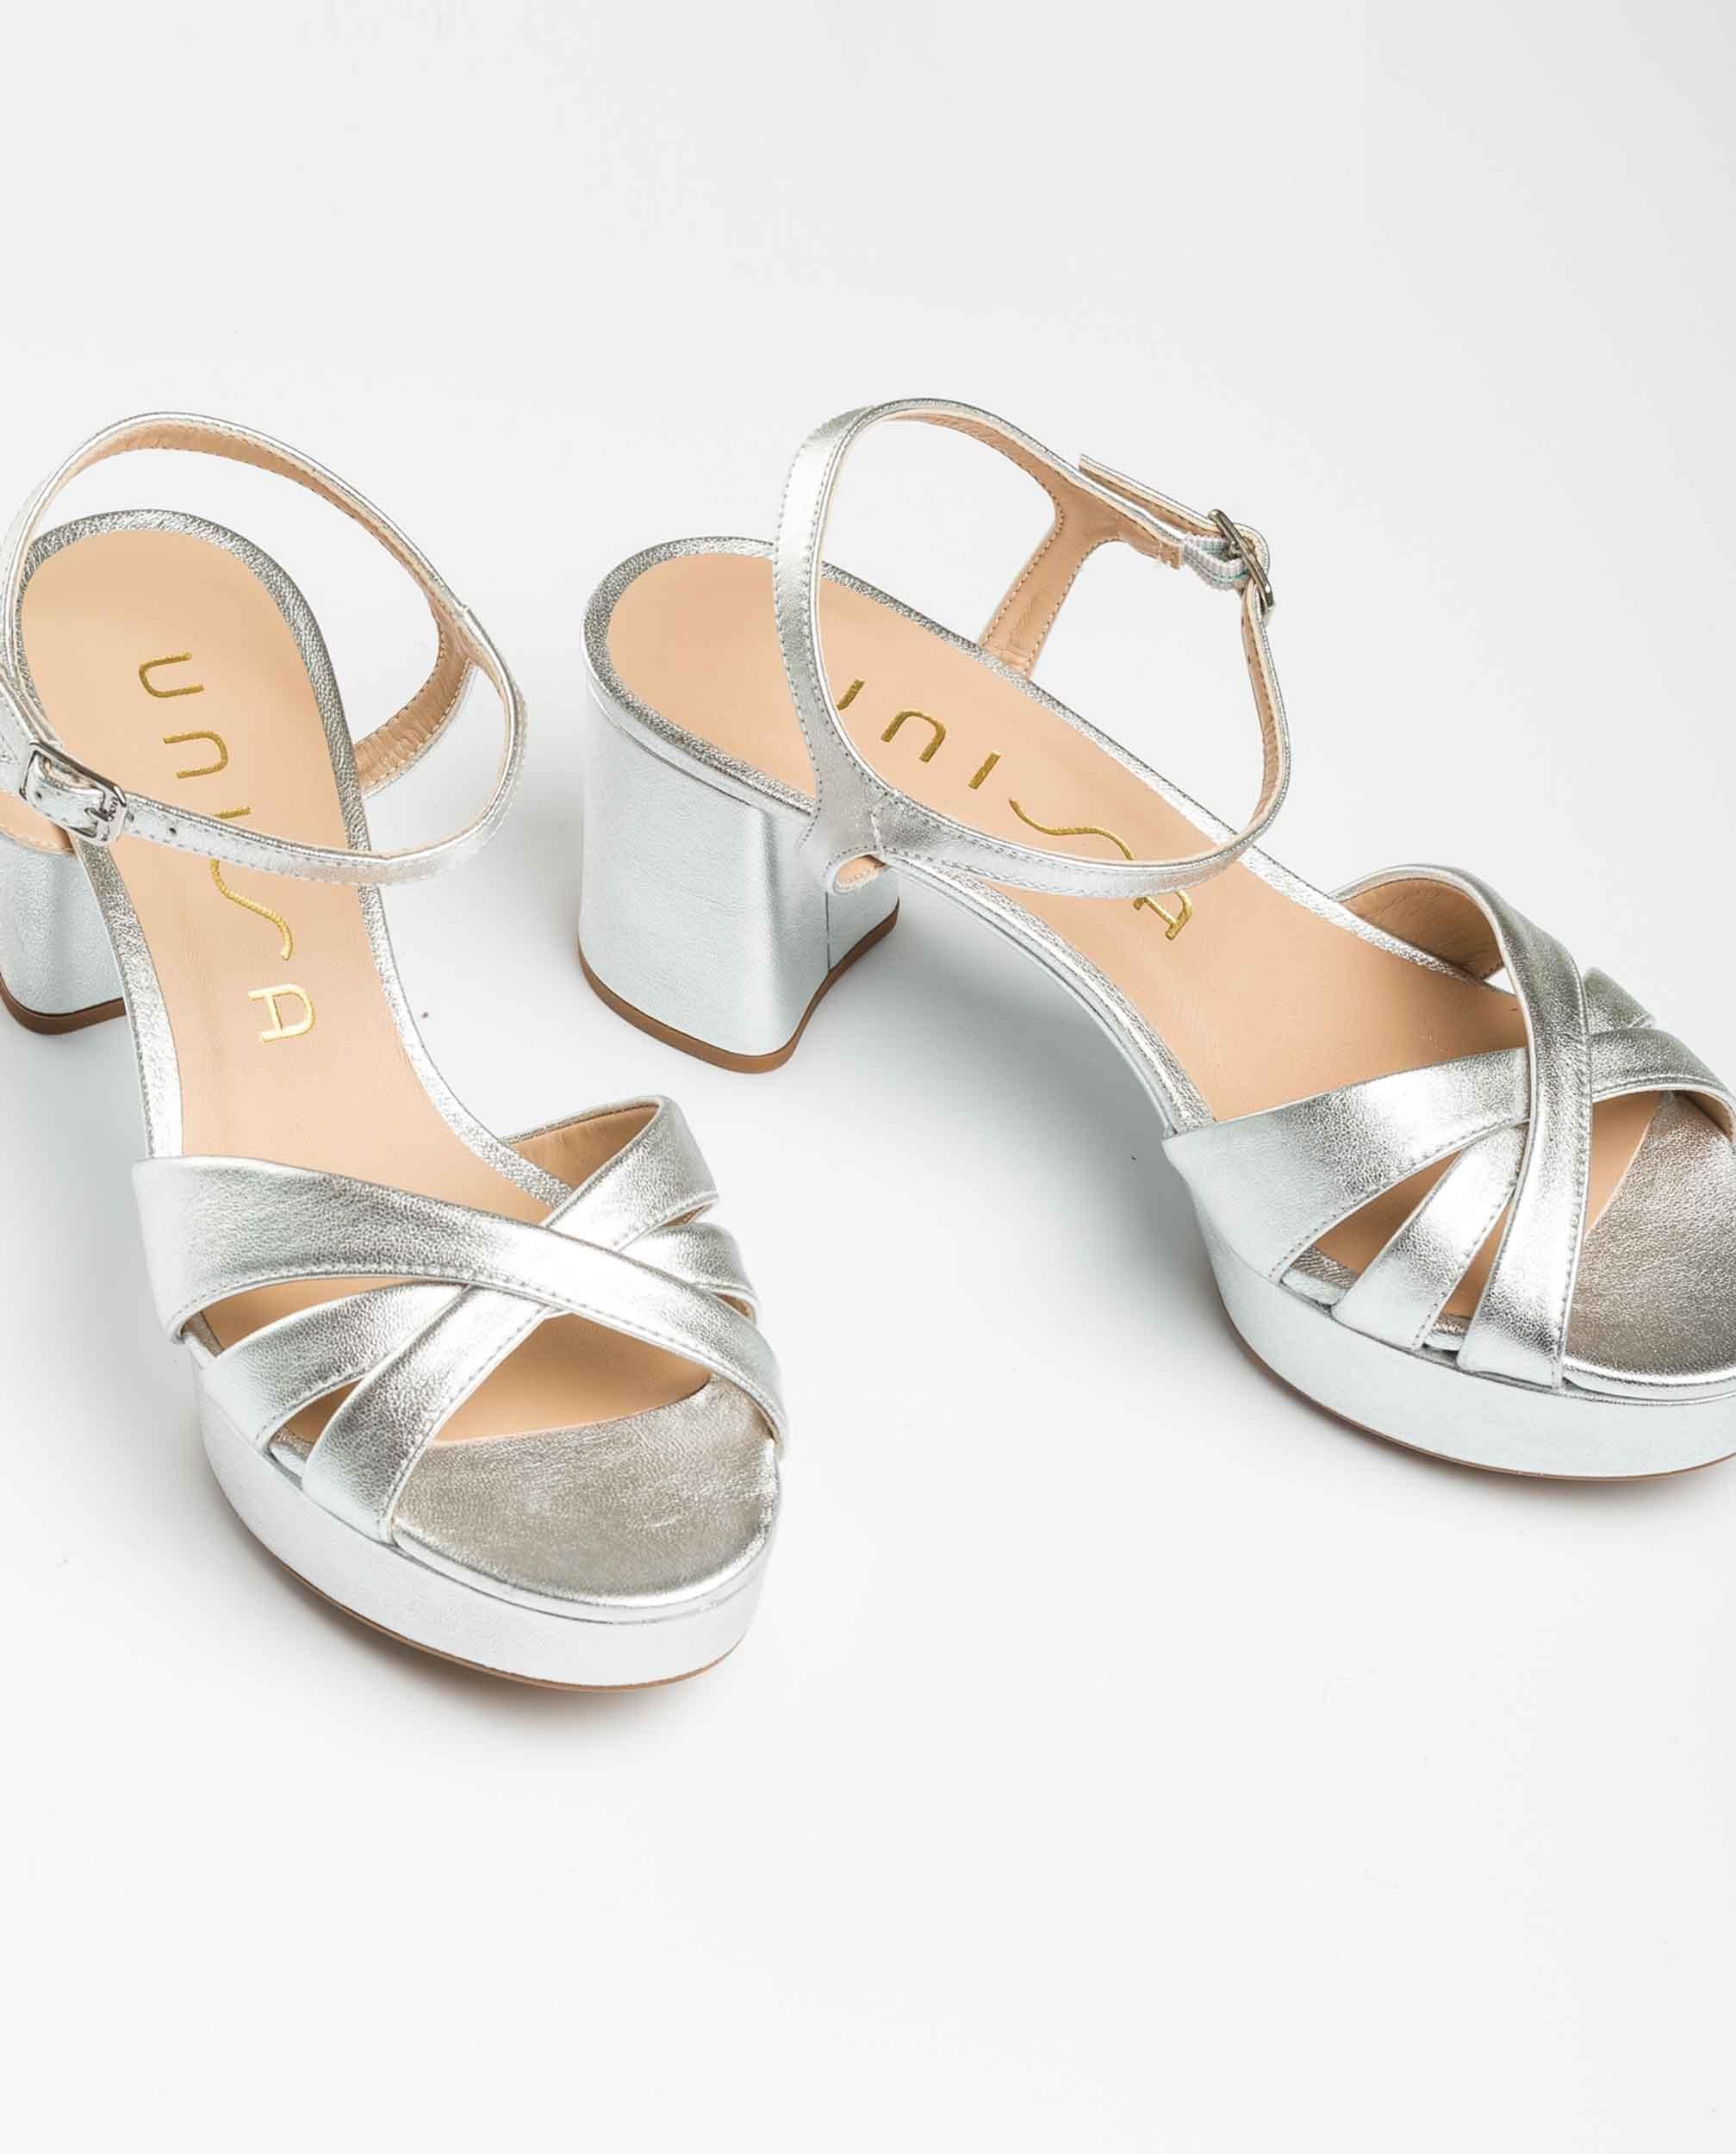 UNISA Metallic-Sandaletten mit überkreuzten Riemen NETA_LMT silver 5